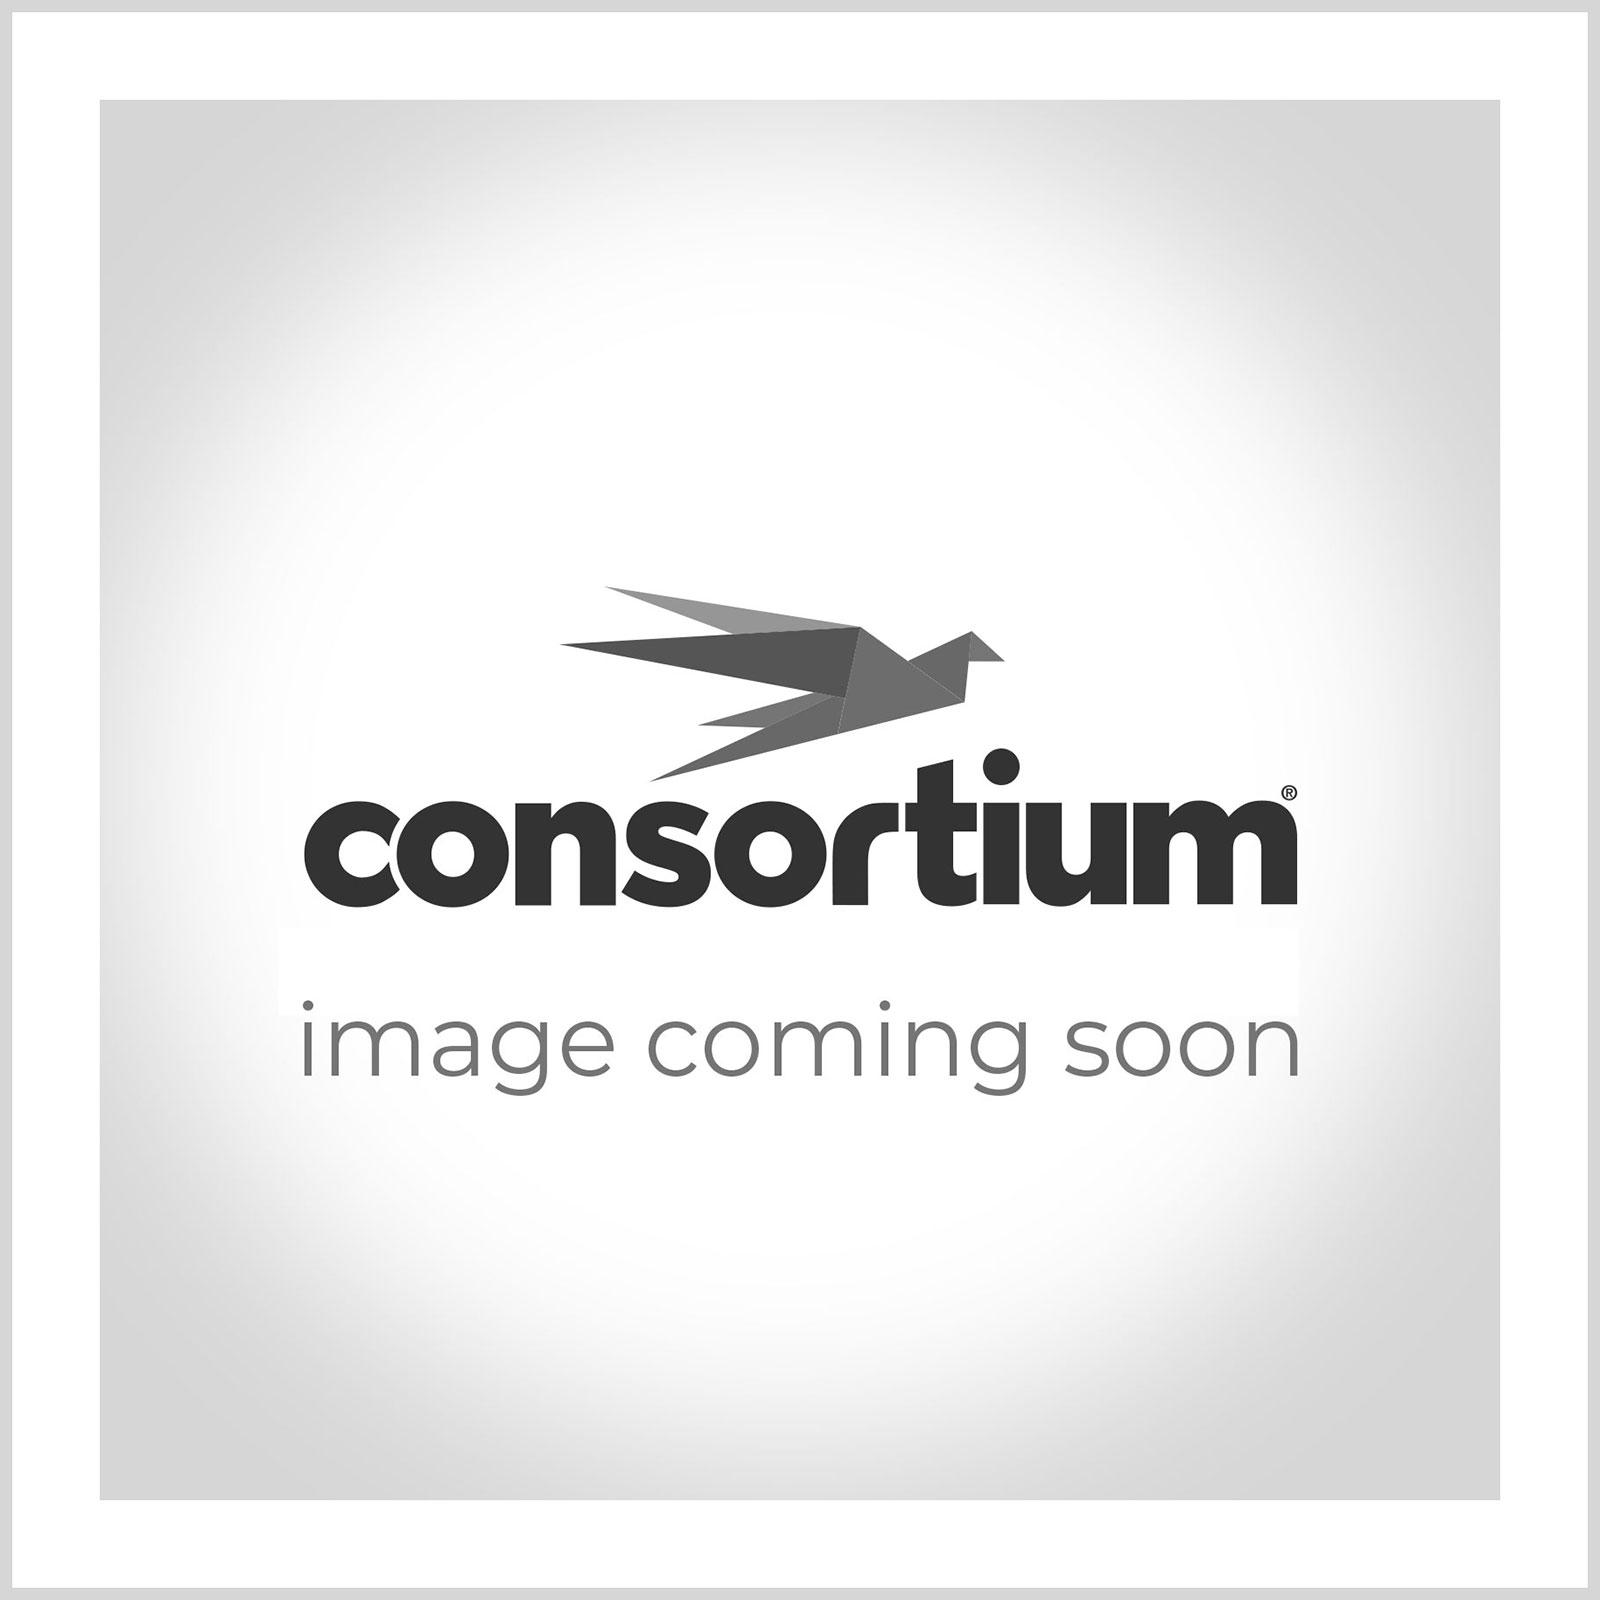 BSI Compliant Premier First Aid Kit Refills